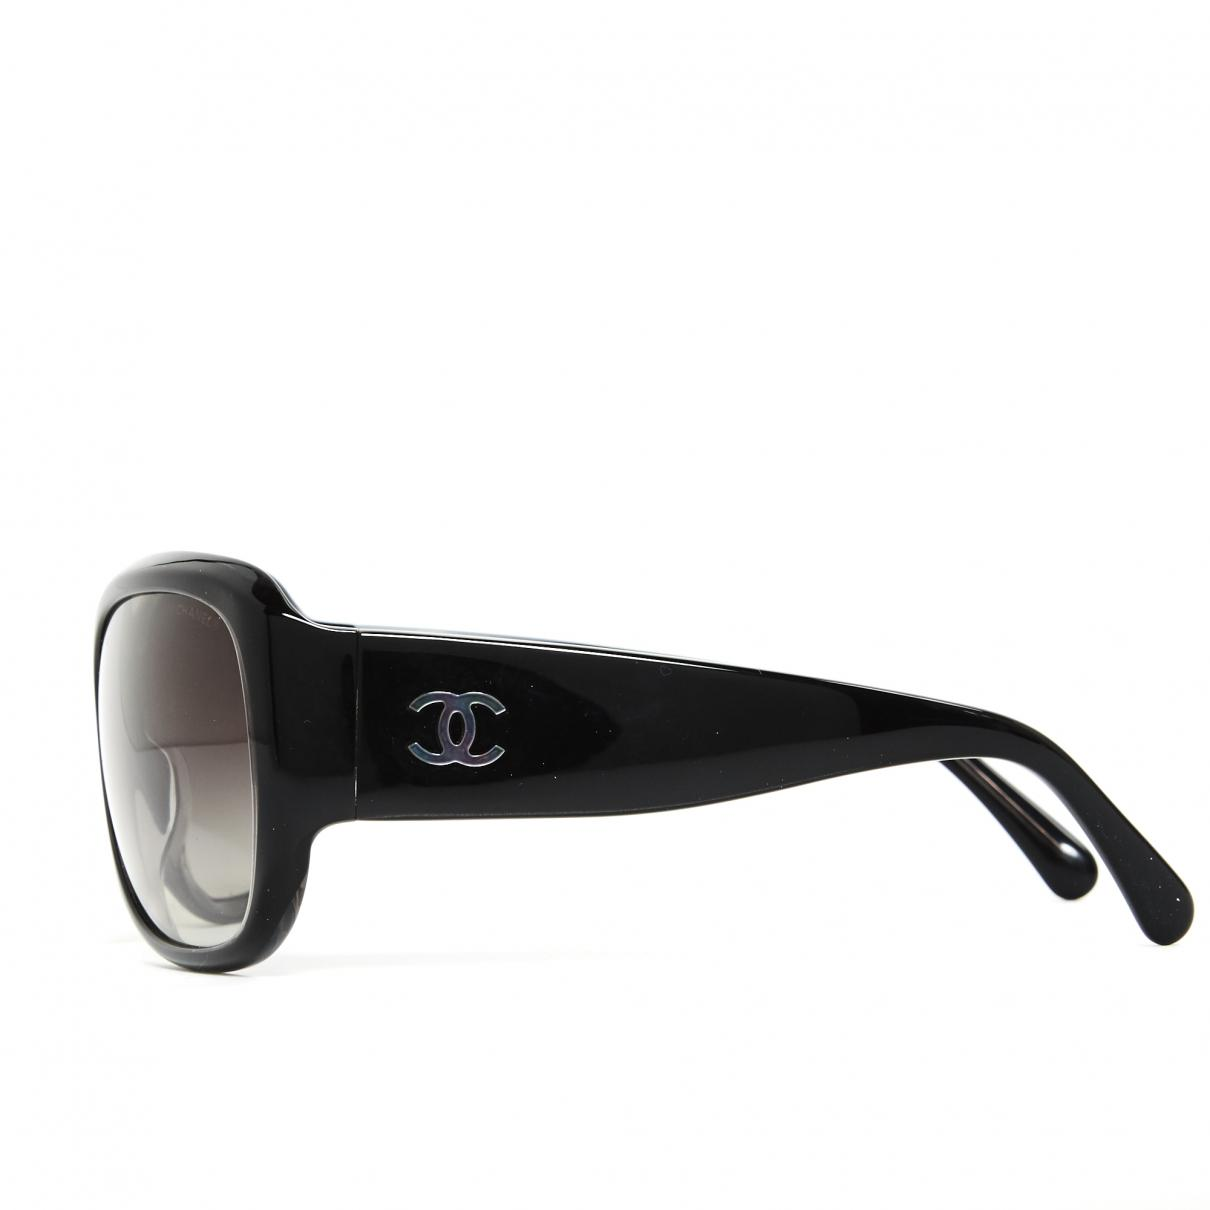 3f1676582c66 Lyst - Chanel Oversized Sunglasses in Black